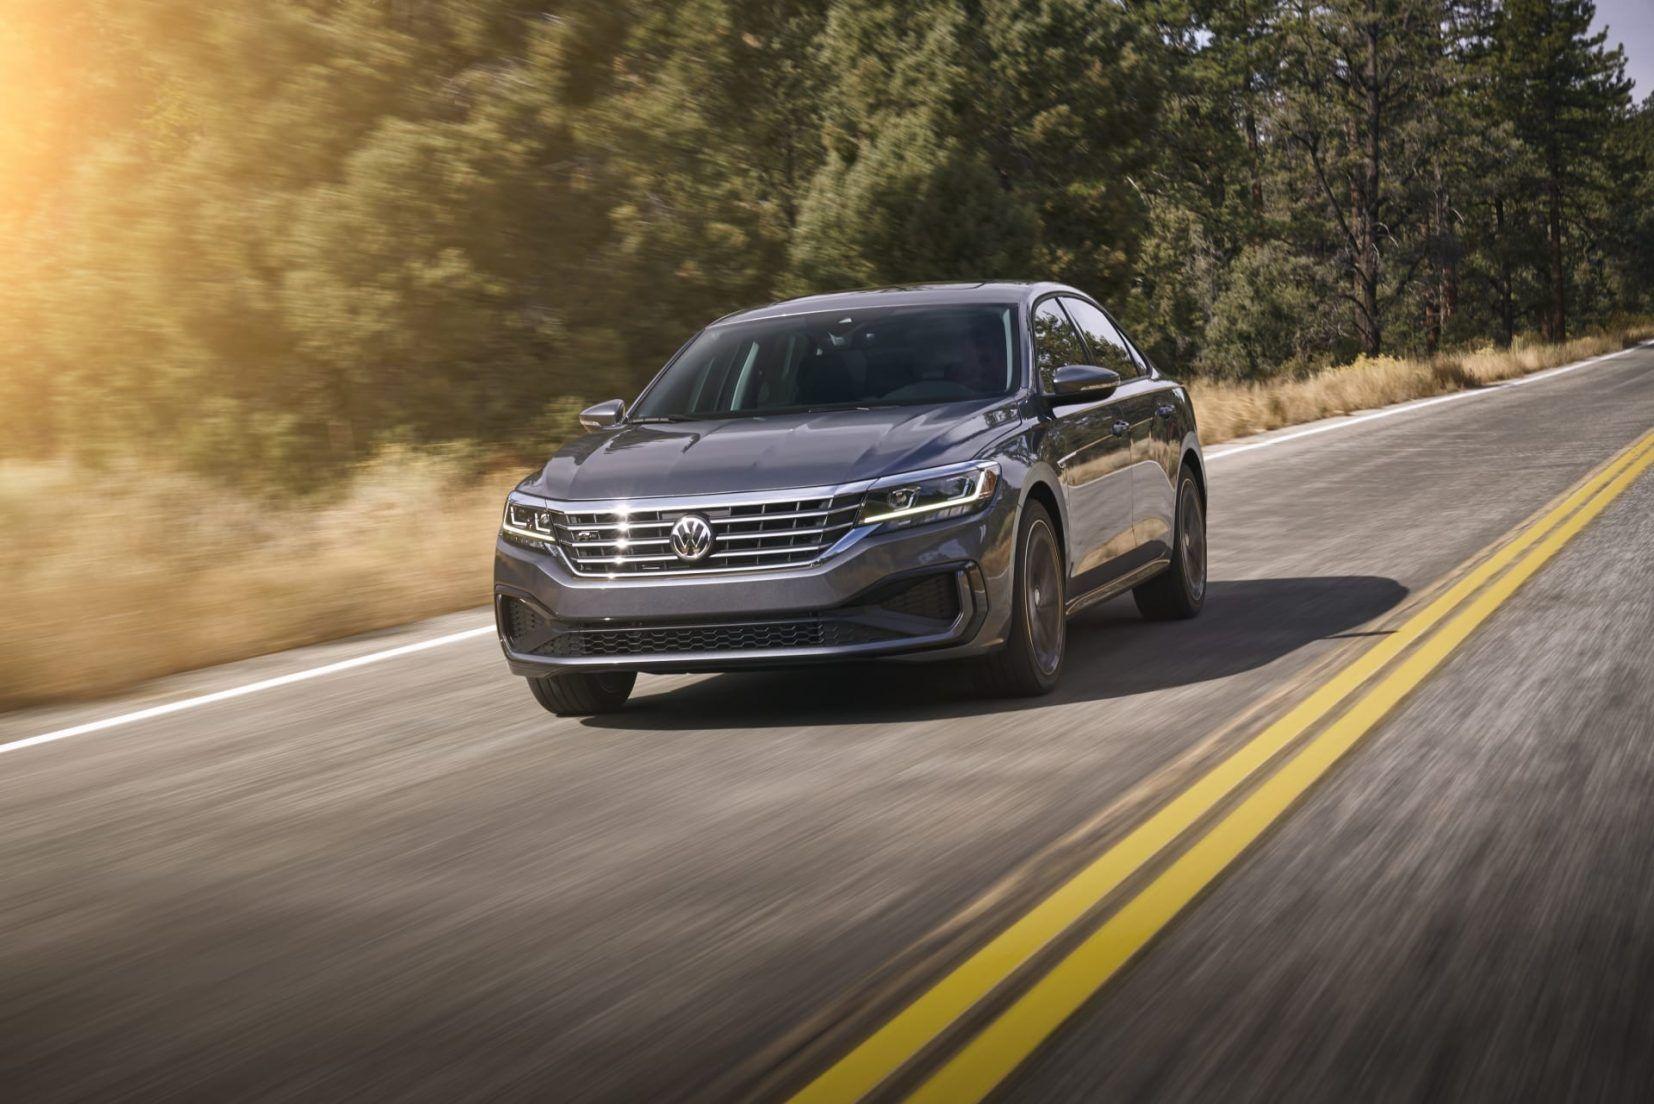 2020 Volkswagen Passat Review Design Engine Features And Photos Dengan Gambar